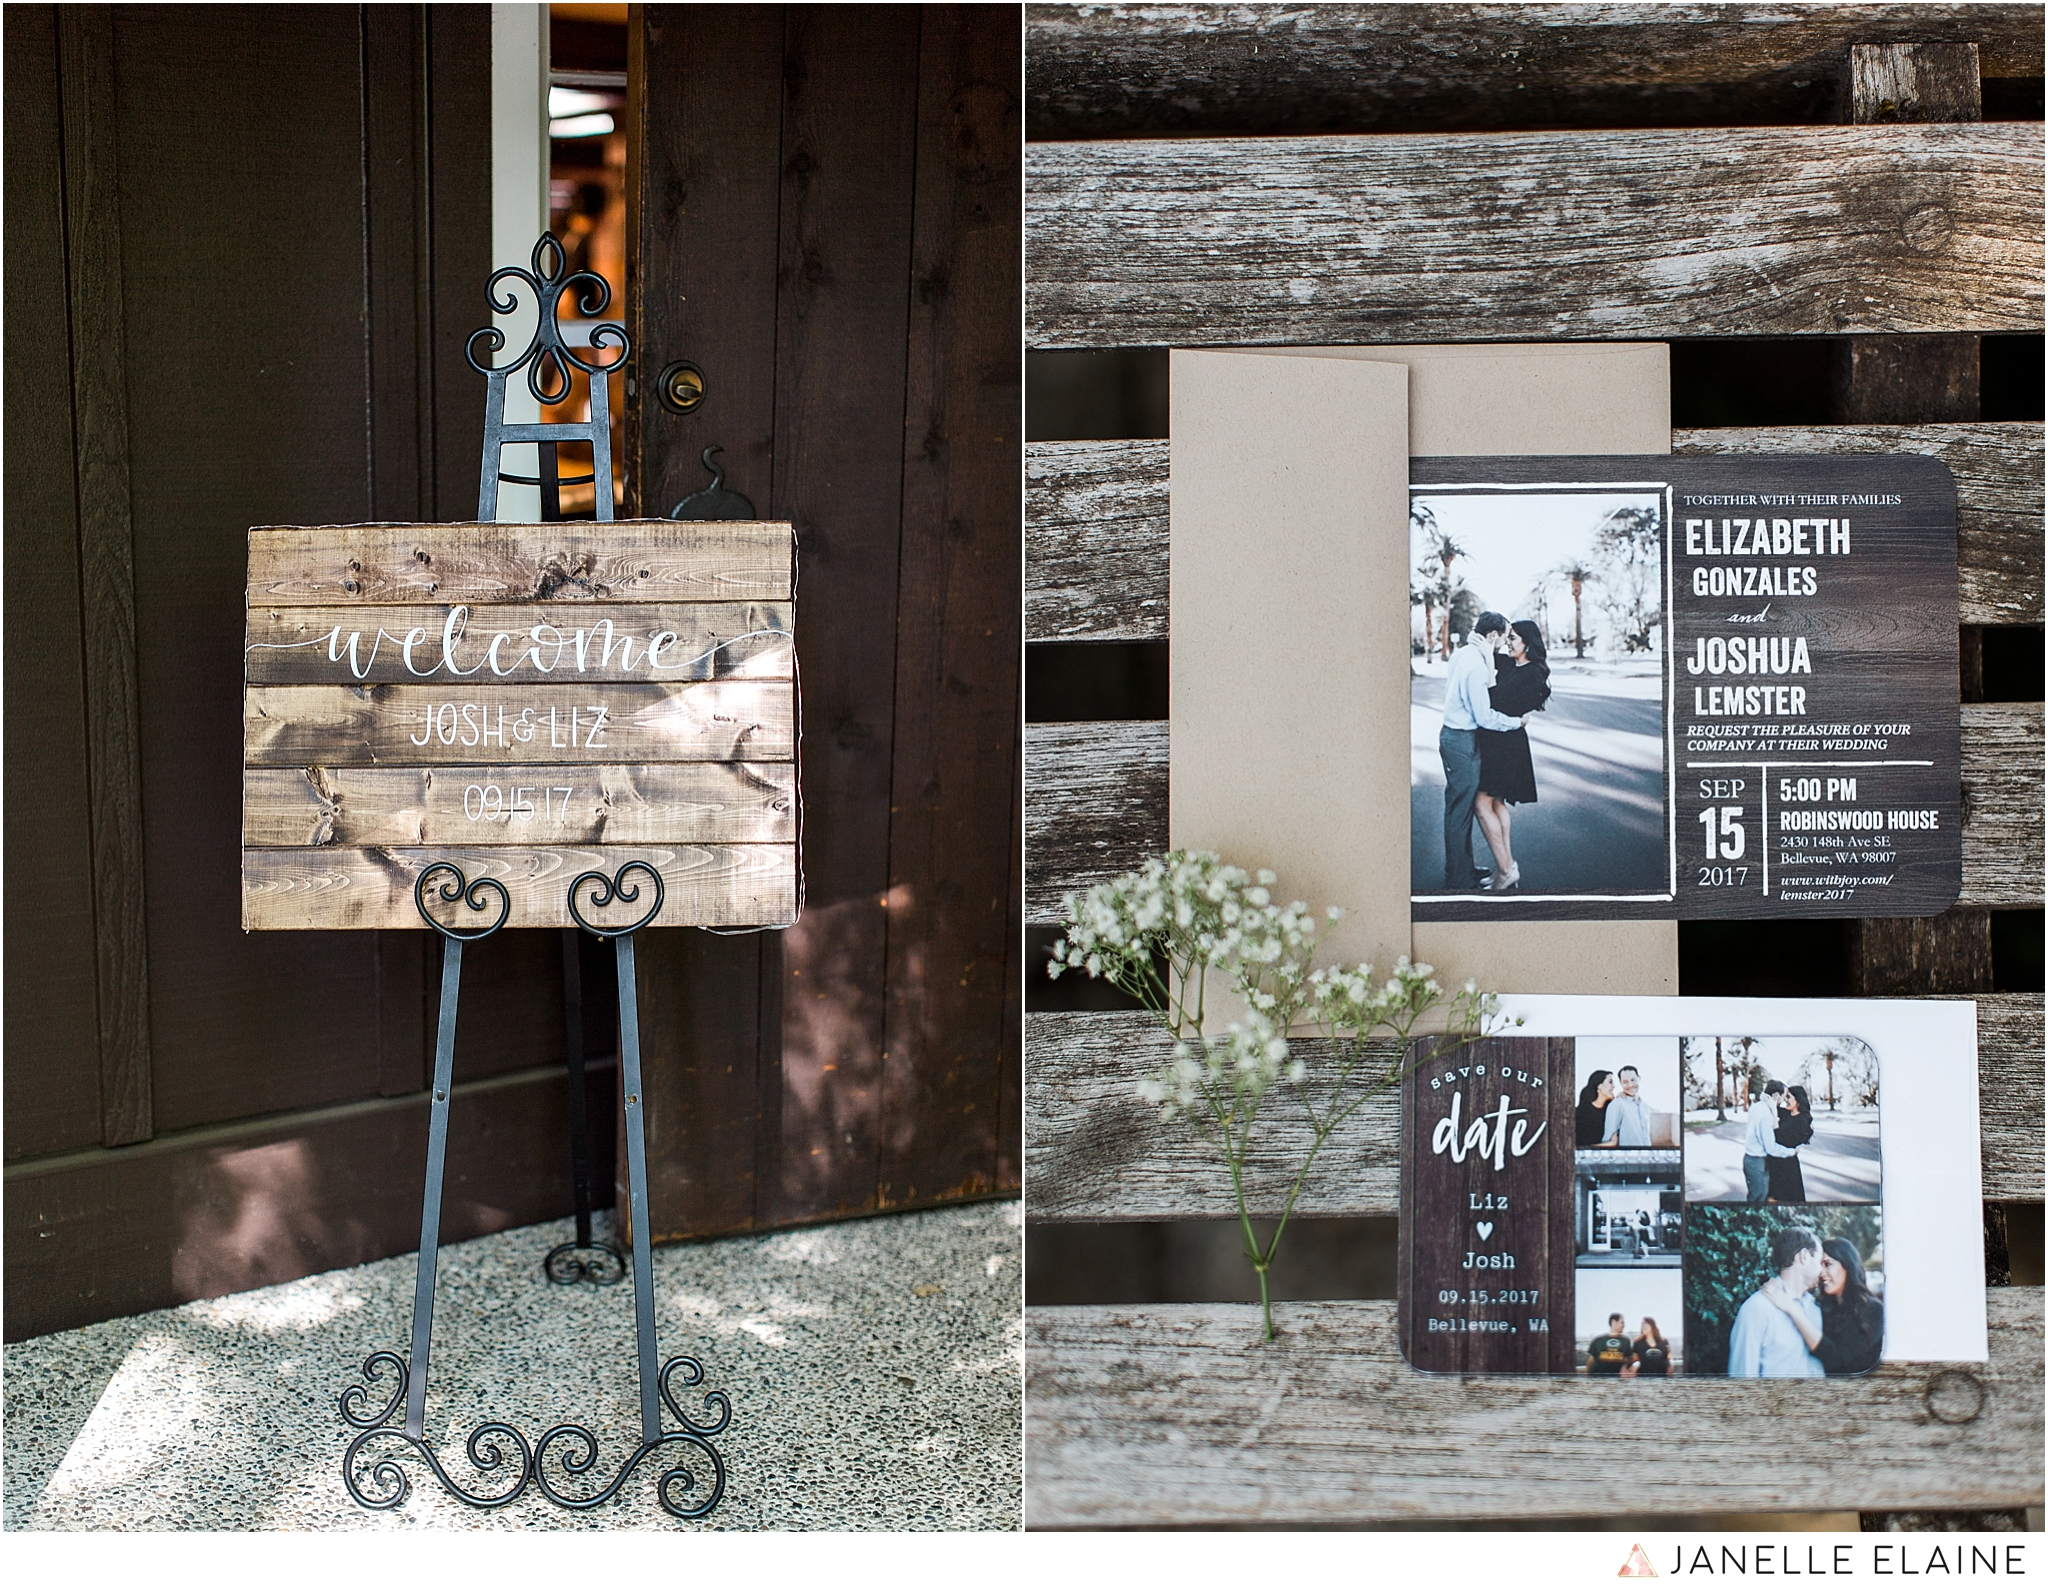 janelle elaine photography-professional wedding photographer-seattle-bellevue-robinswood house-23.jpg